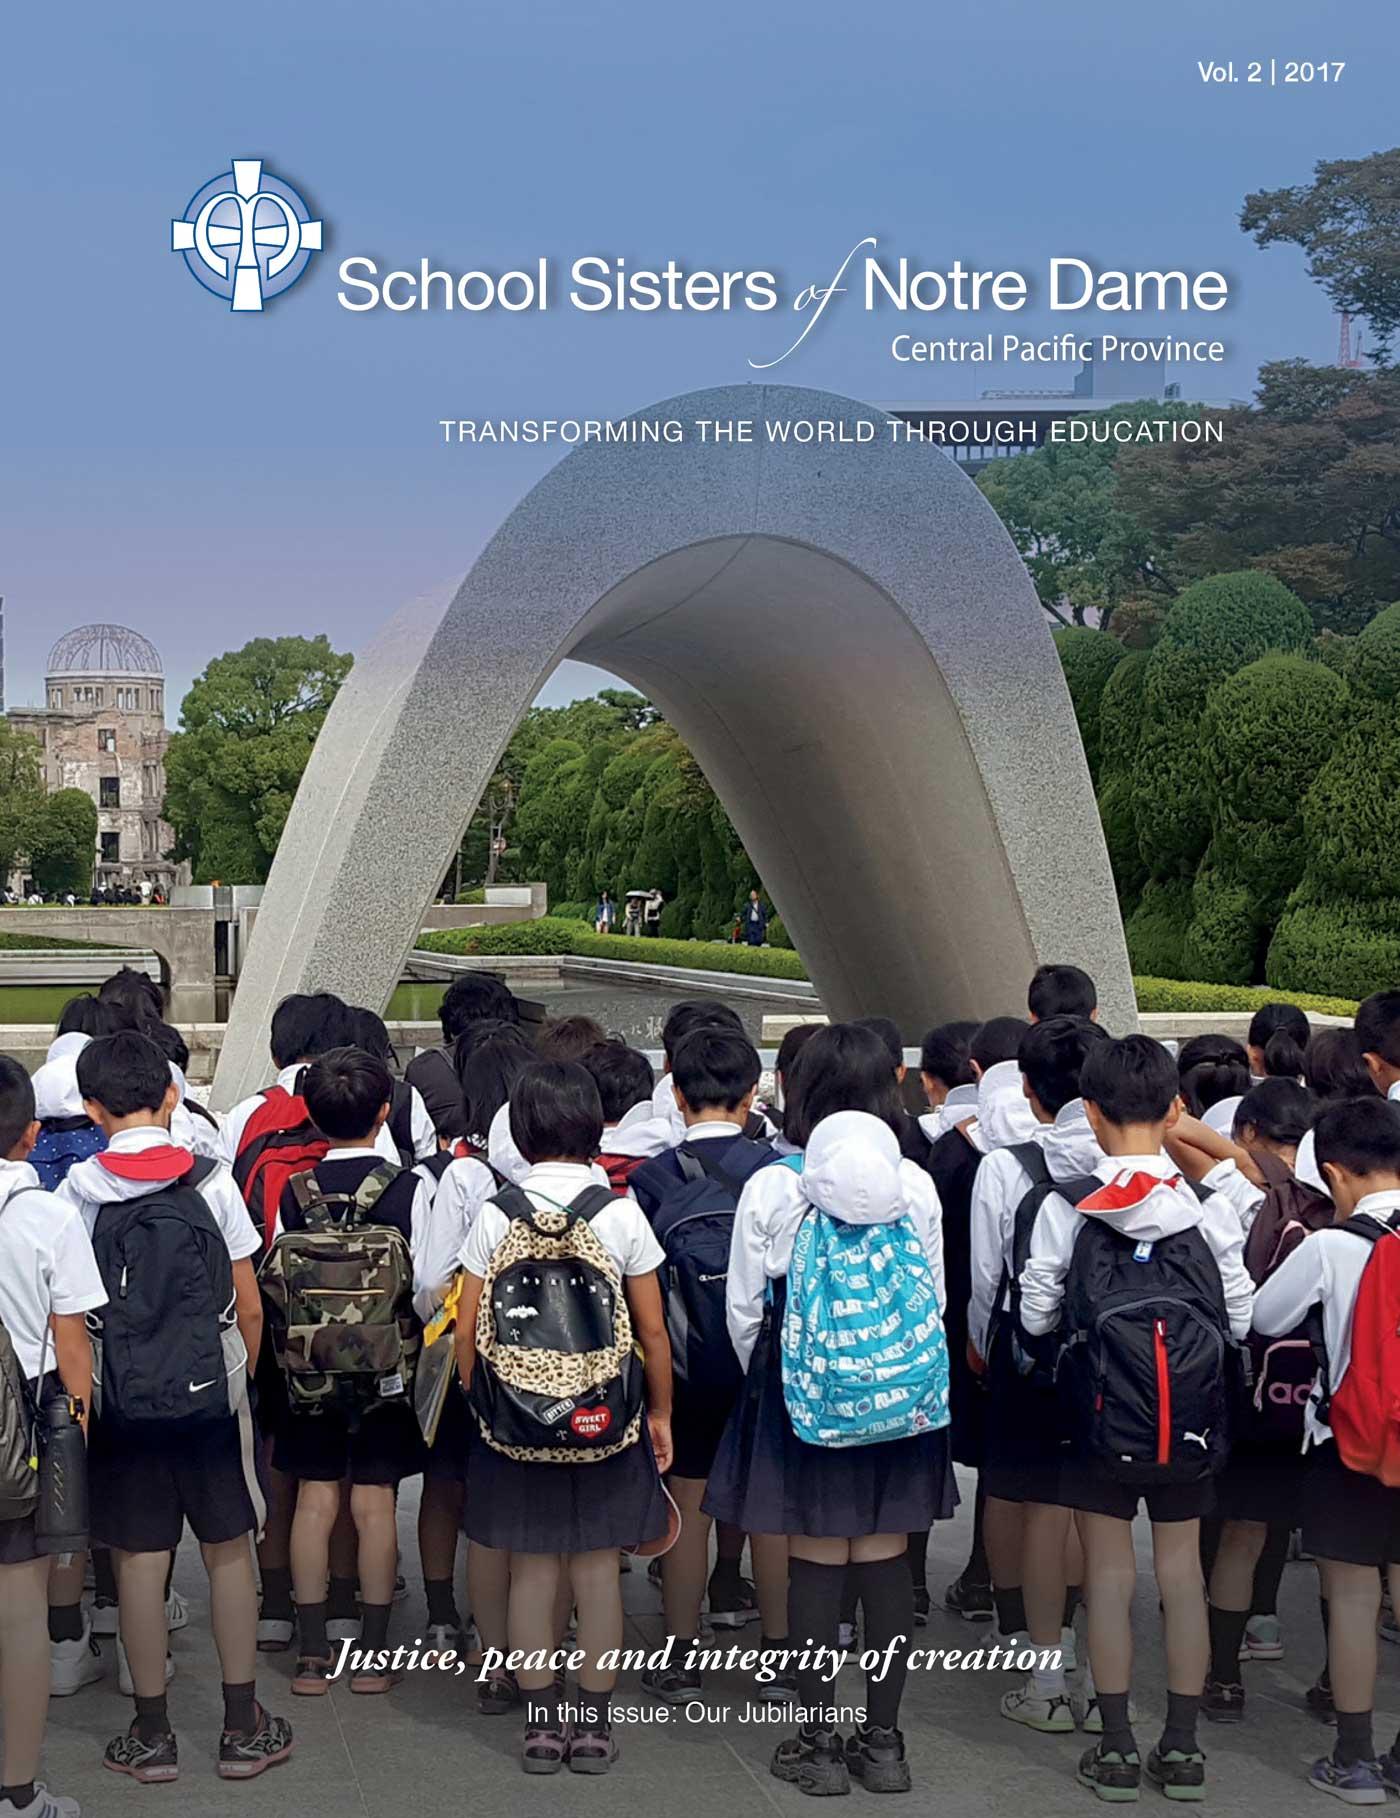 ON THE COVER: Students gather around the Cenotaph at Hiroshima Peace Memorial Park in Naka Ward, Hiroshima.